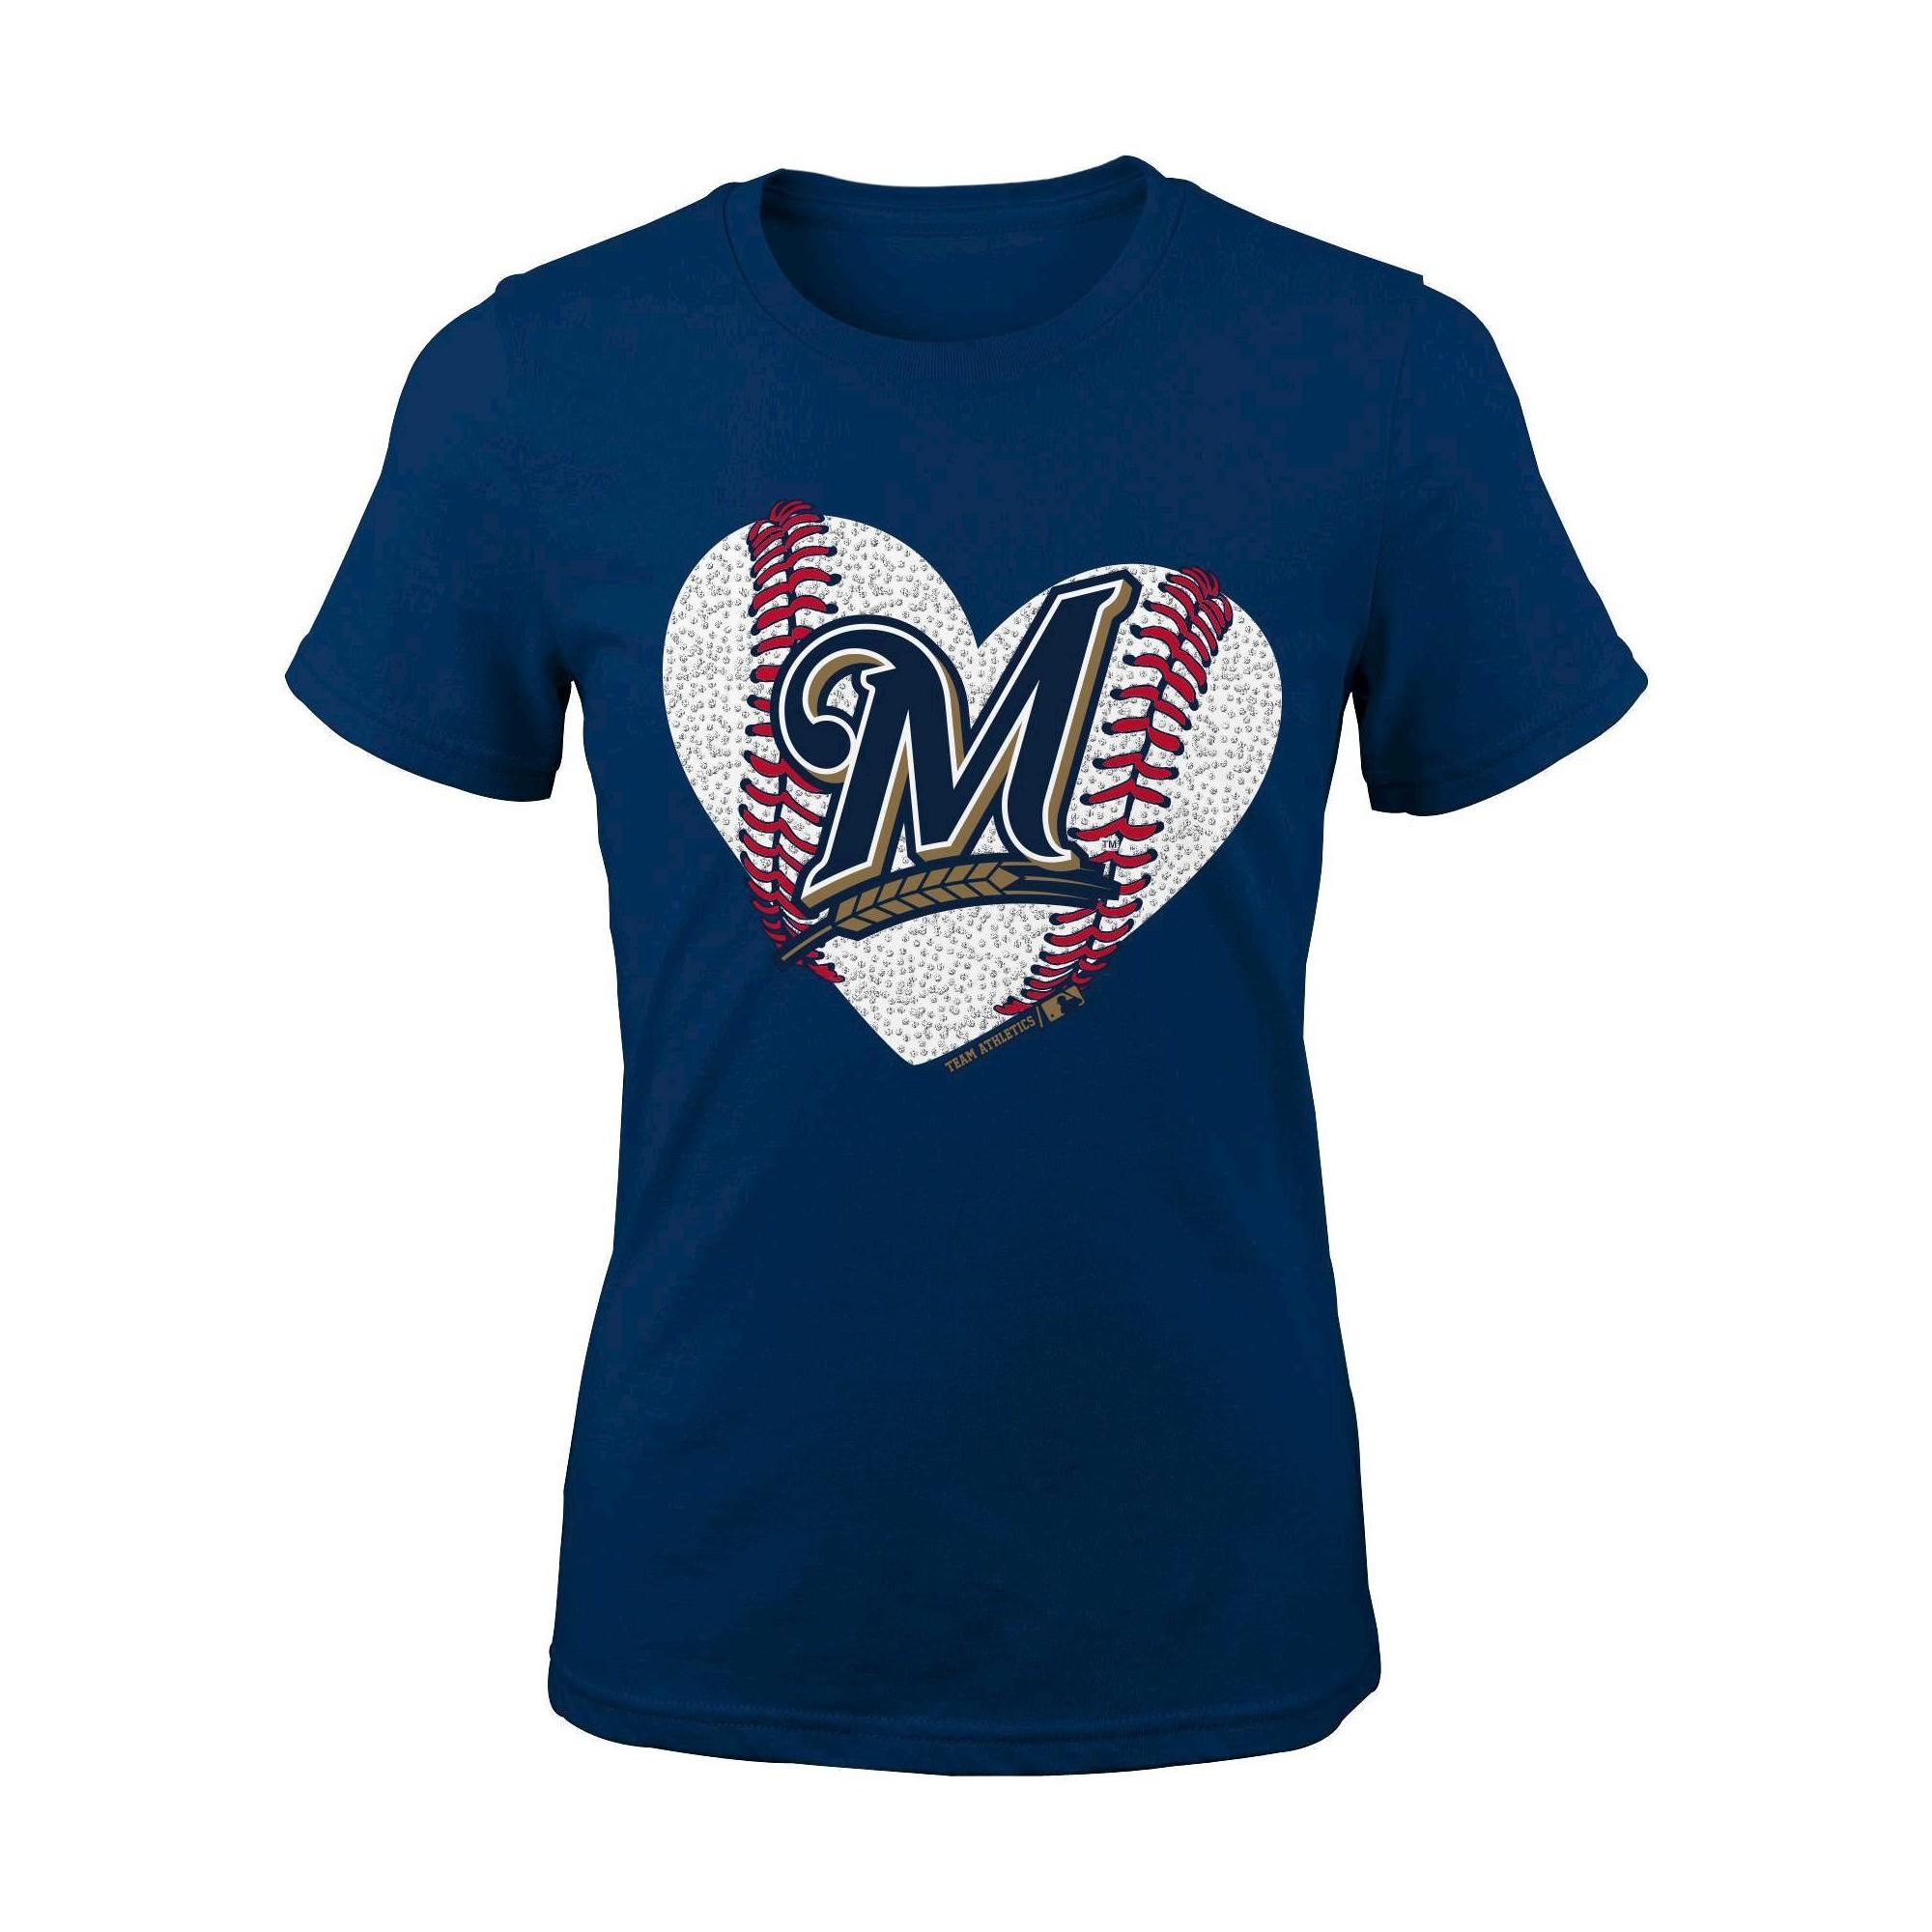 Milwaukee Brewers Girls Crew Neck TShirt XL, Multicolored